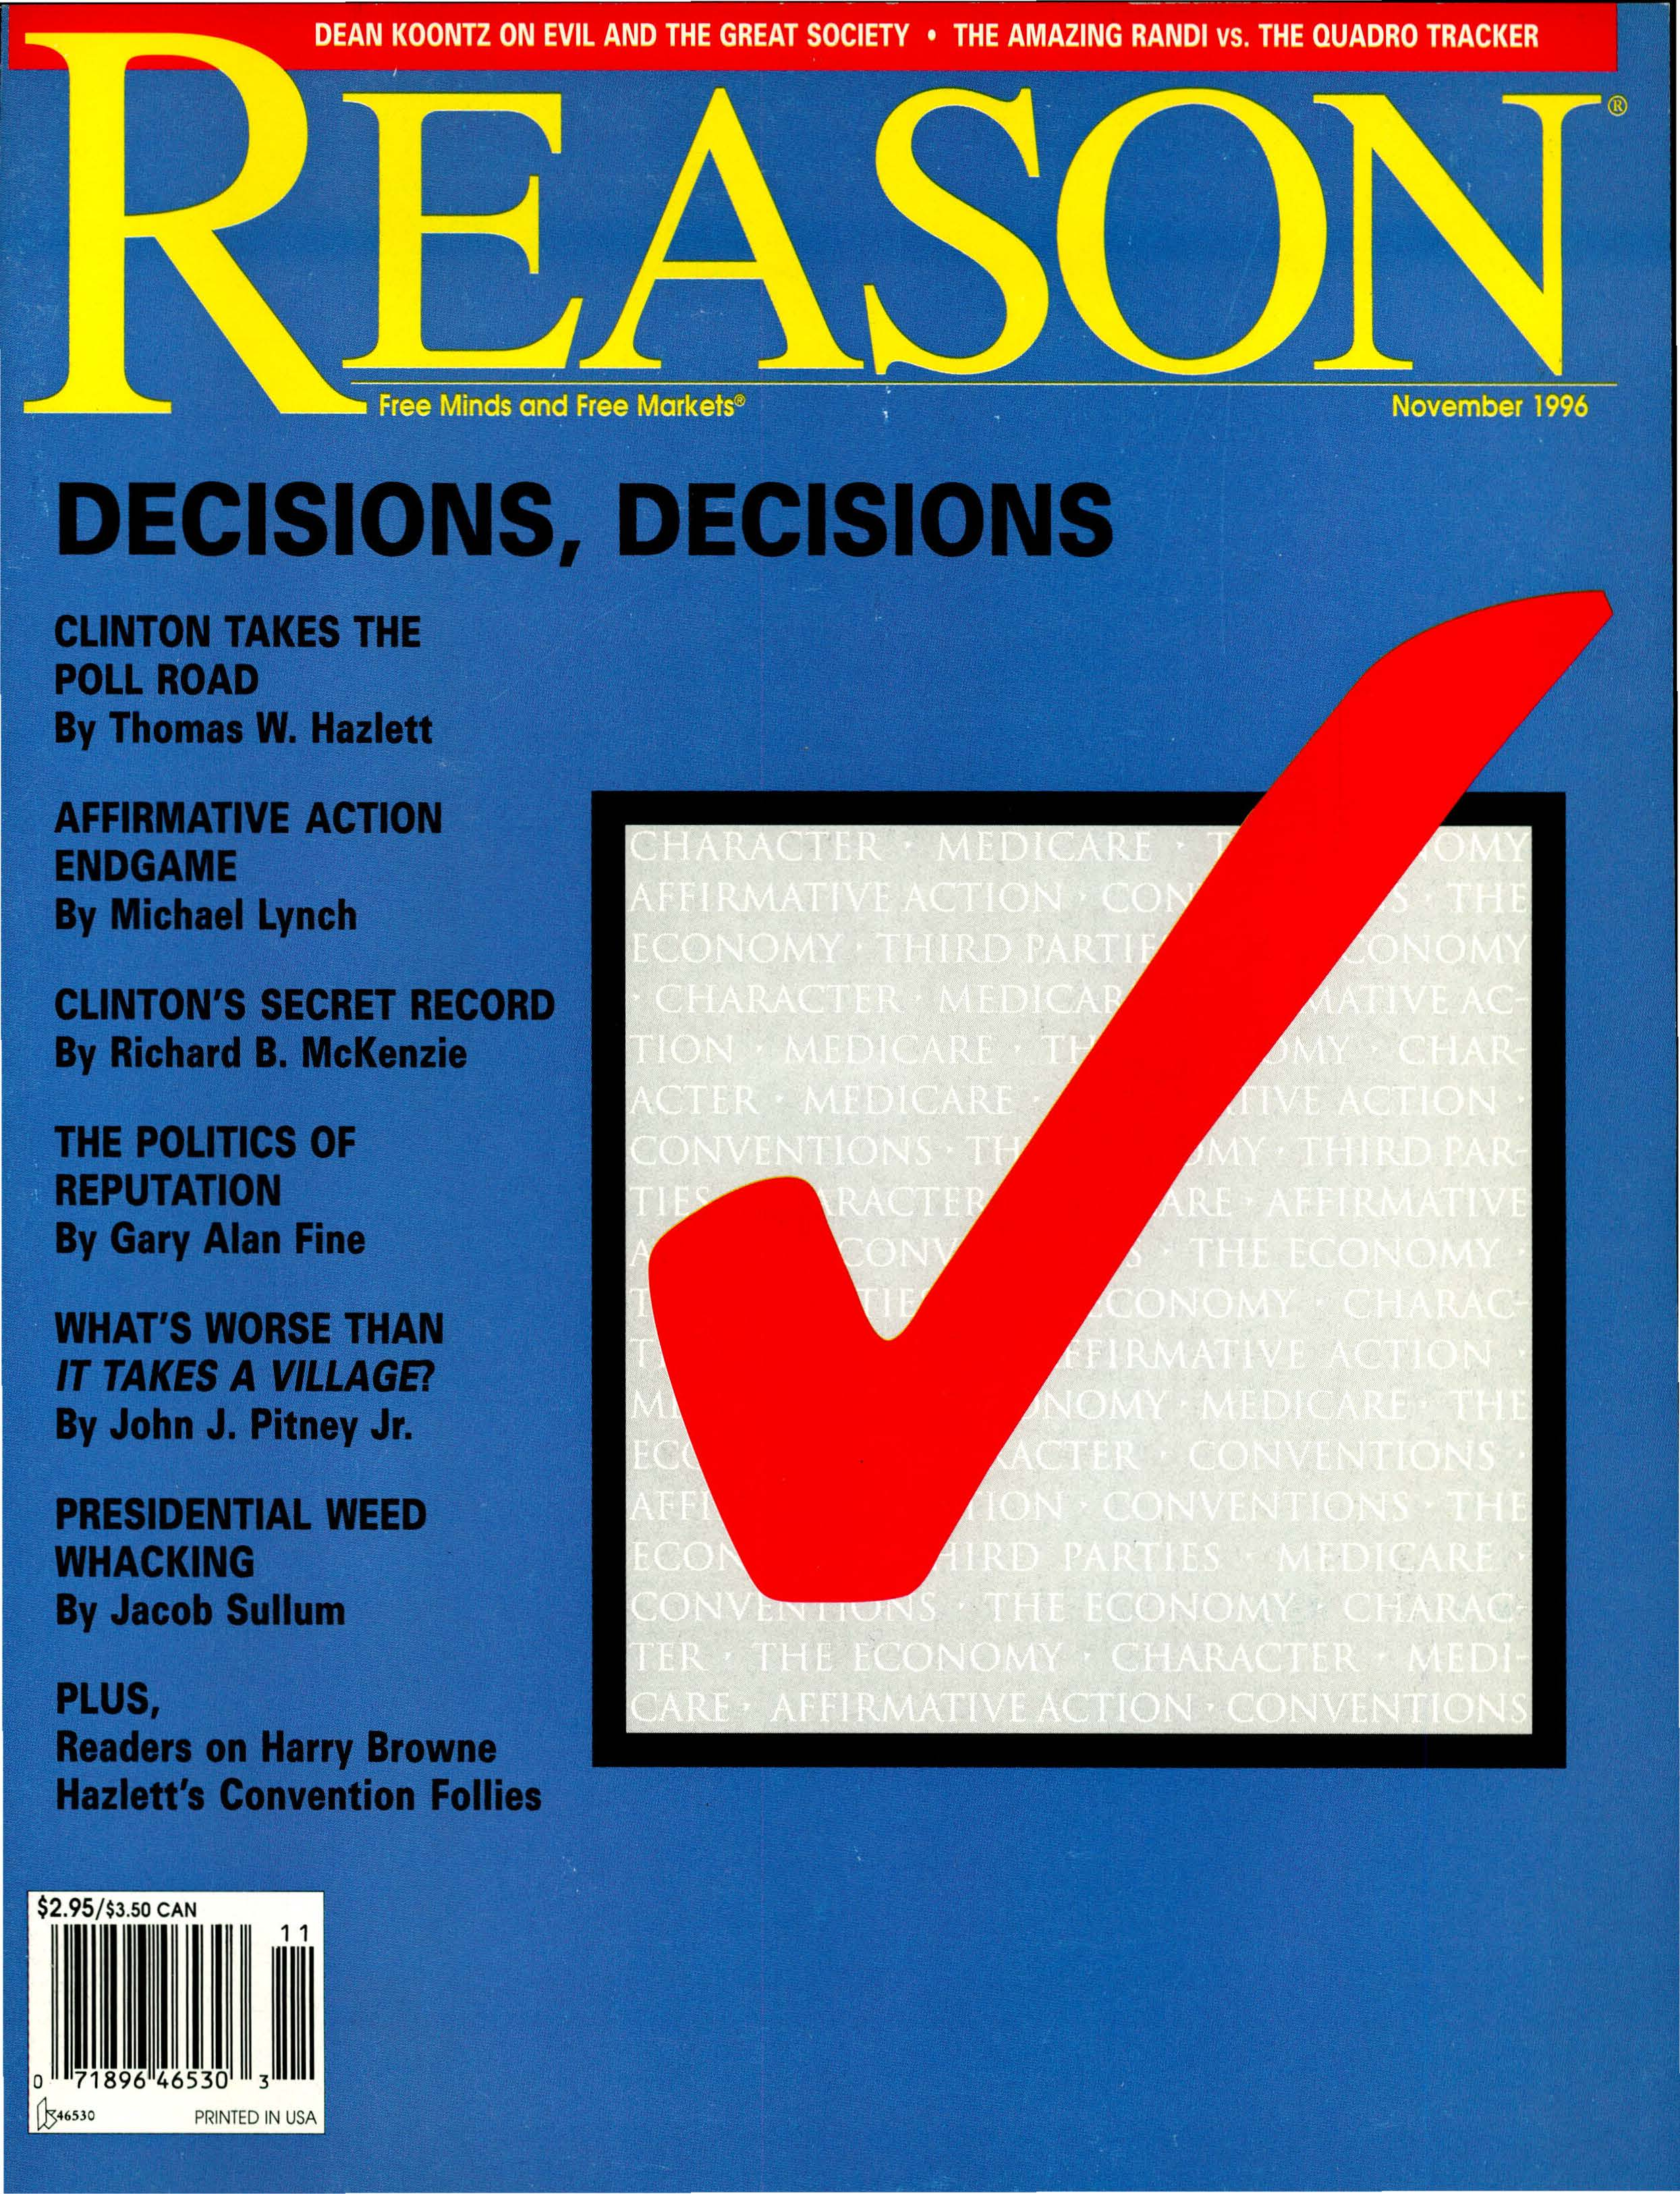 Reason Magazine, November 1996 cover image